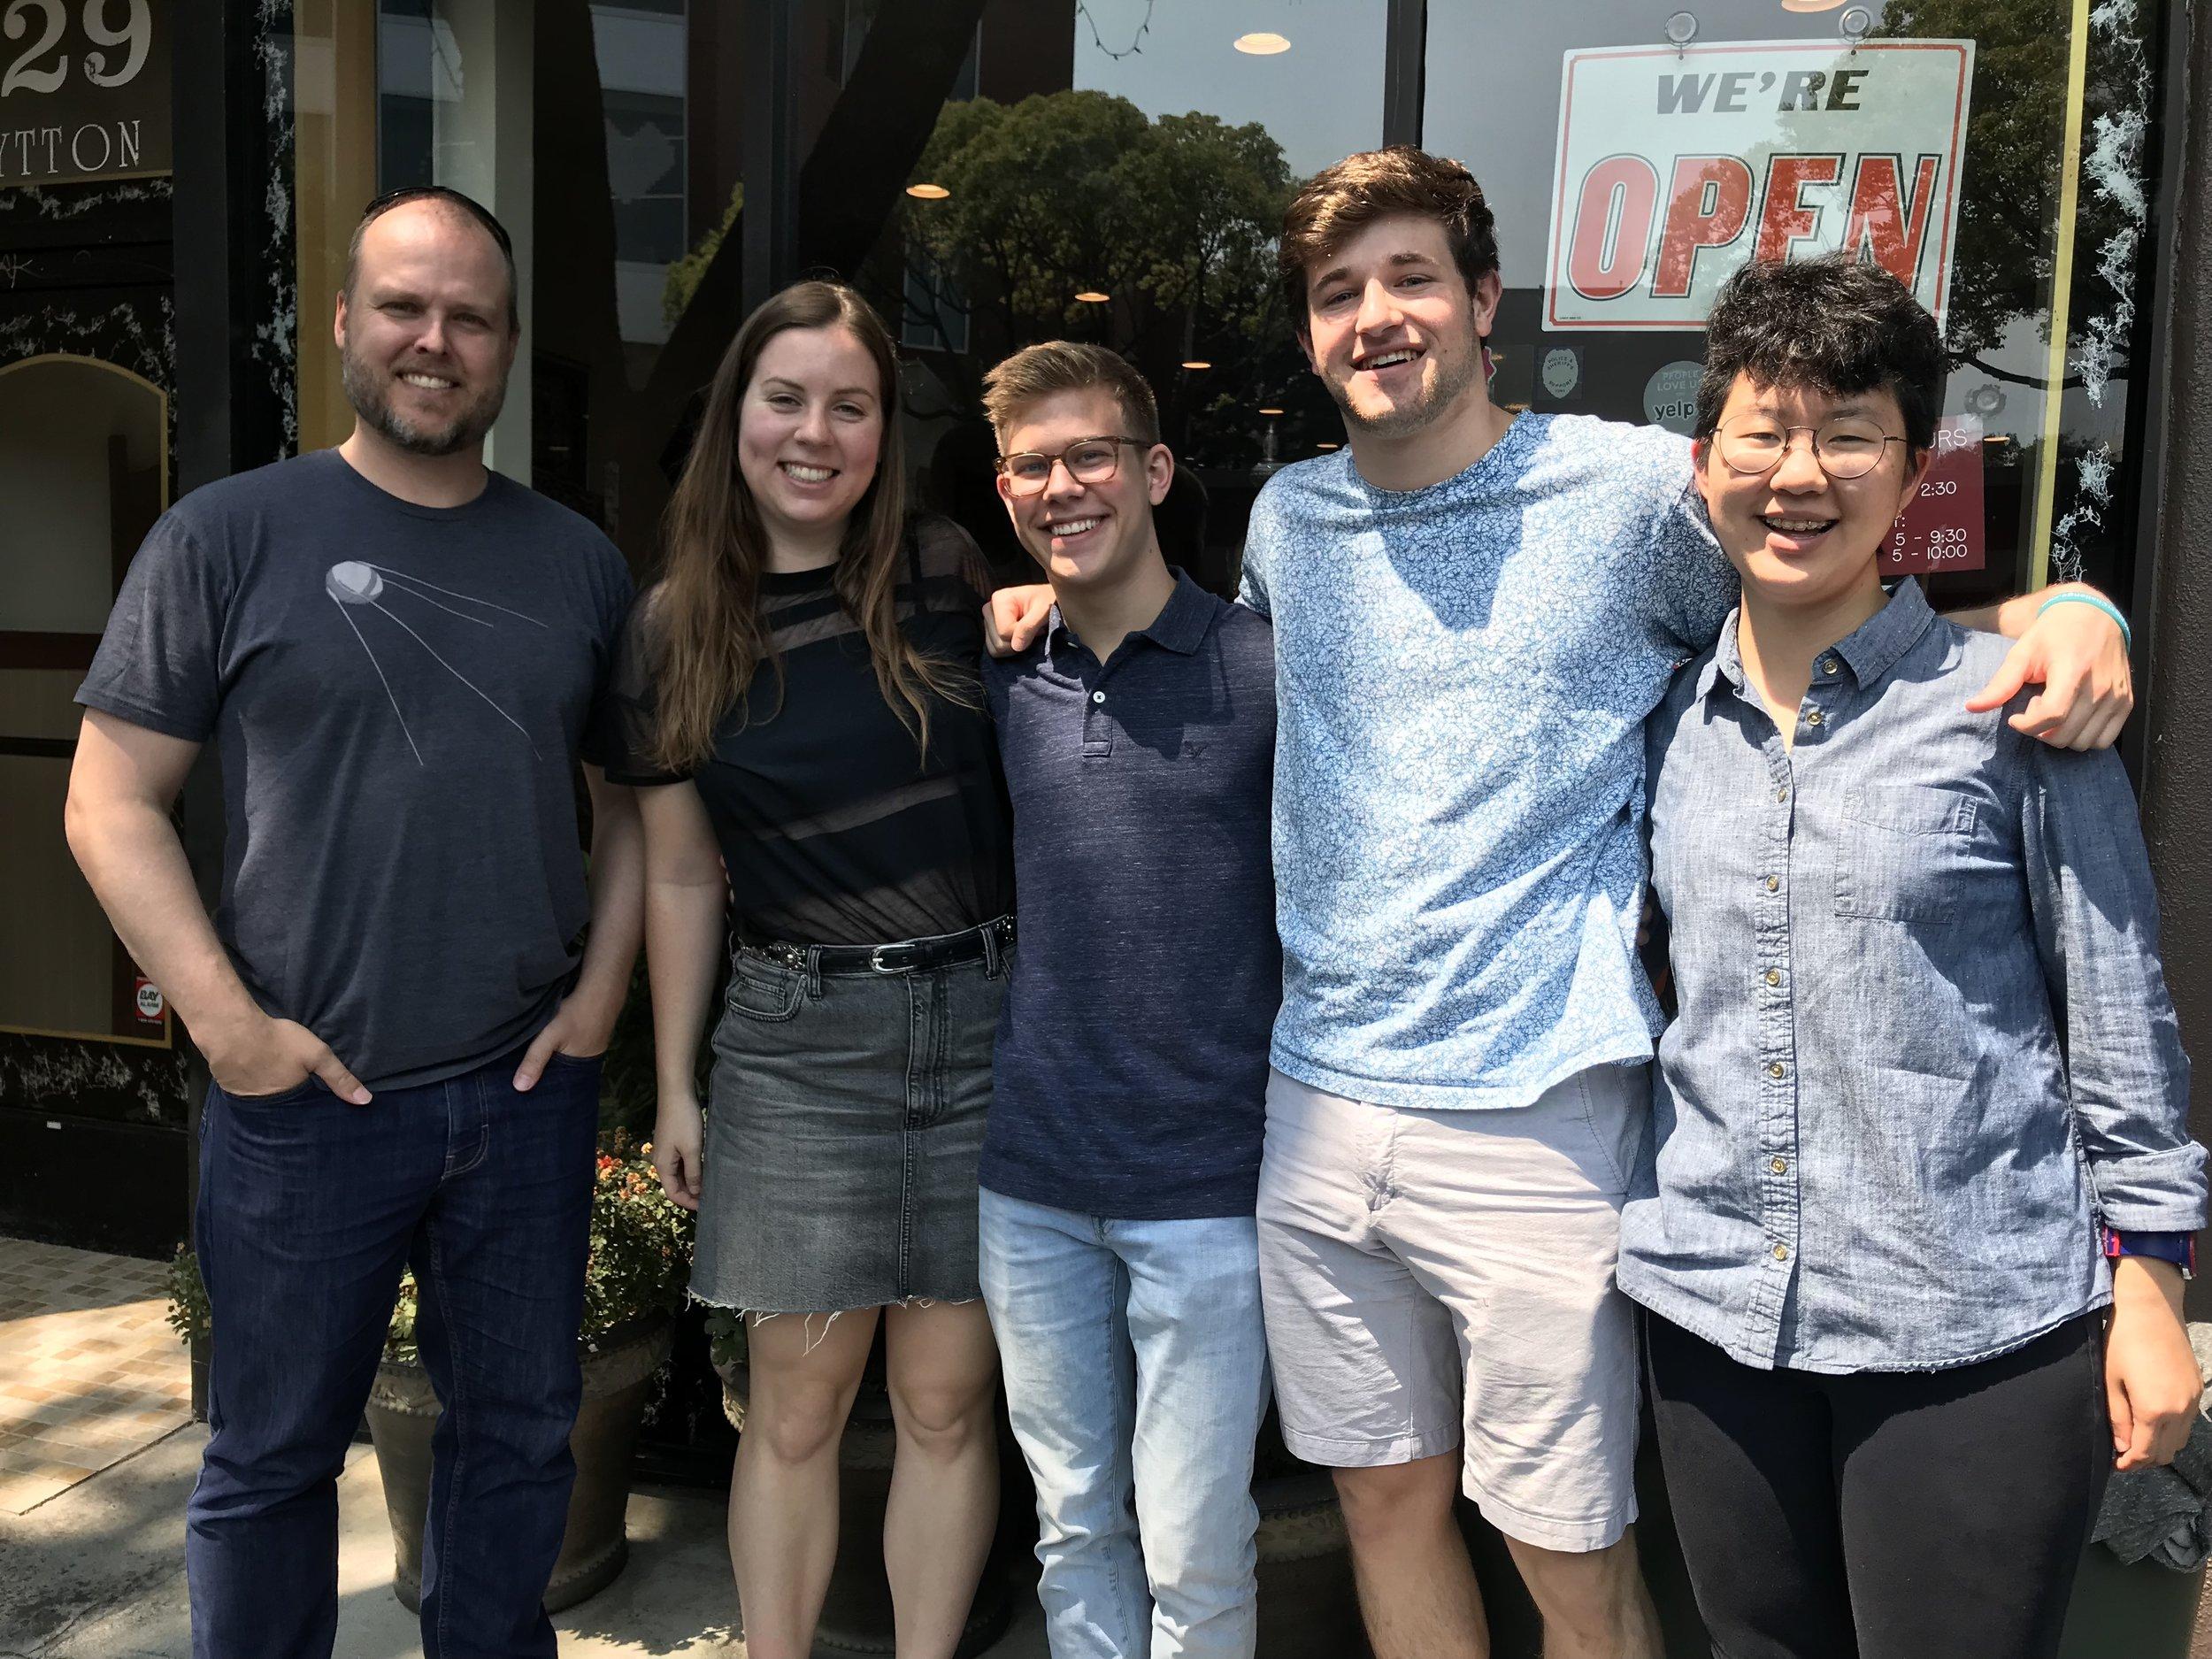 We'll miss our 4 great summer undergrads! - 27 August 18